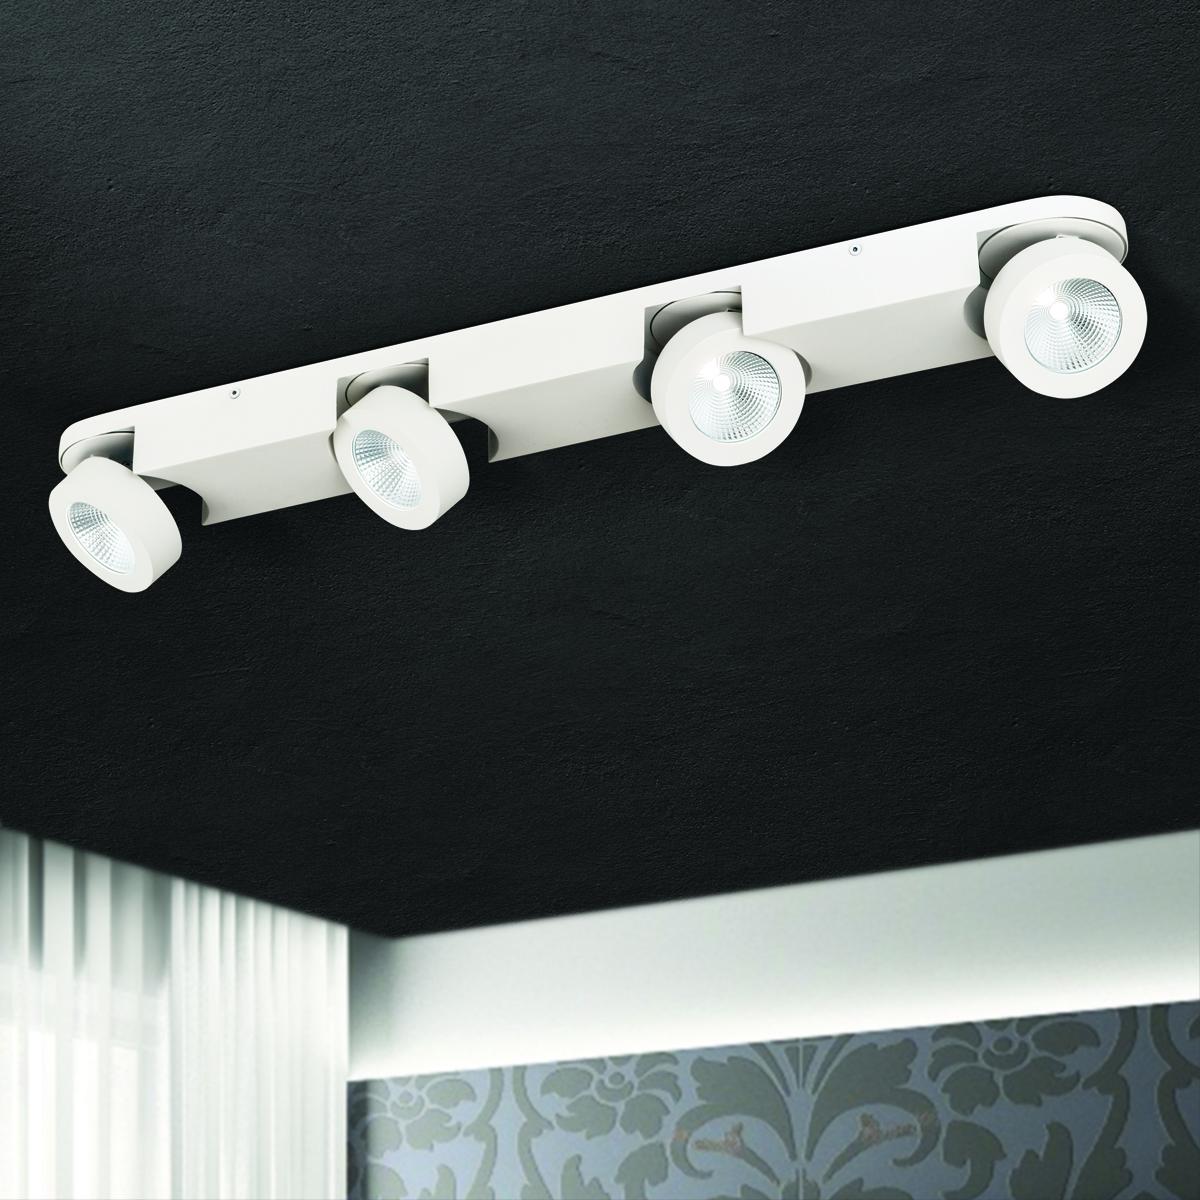 Hausmarke 4er LED-Spot MENO weiß Str 10-467/4 weiß